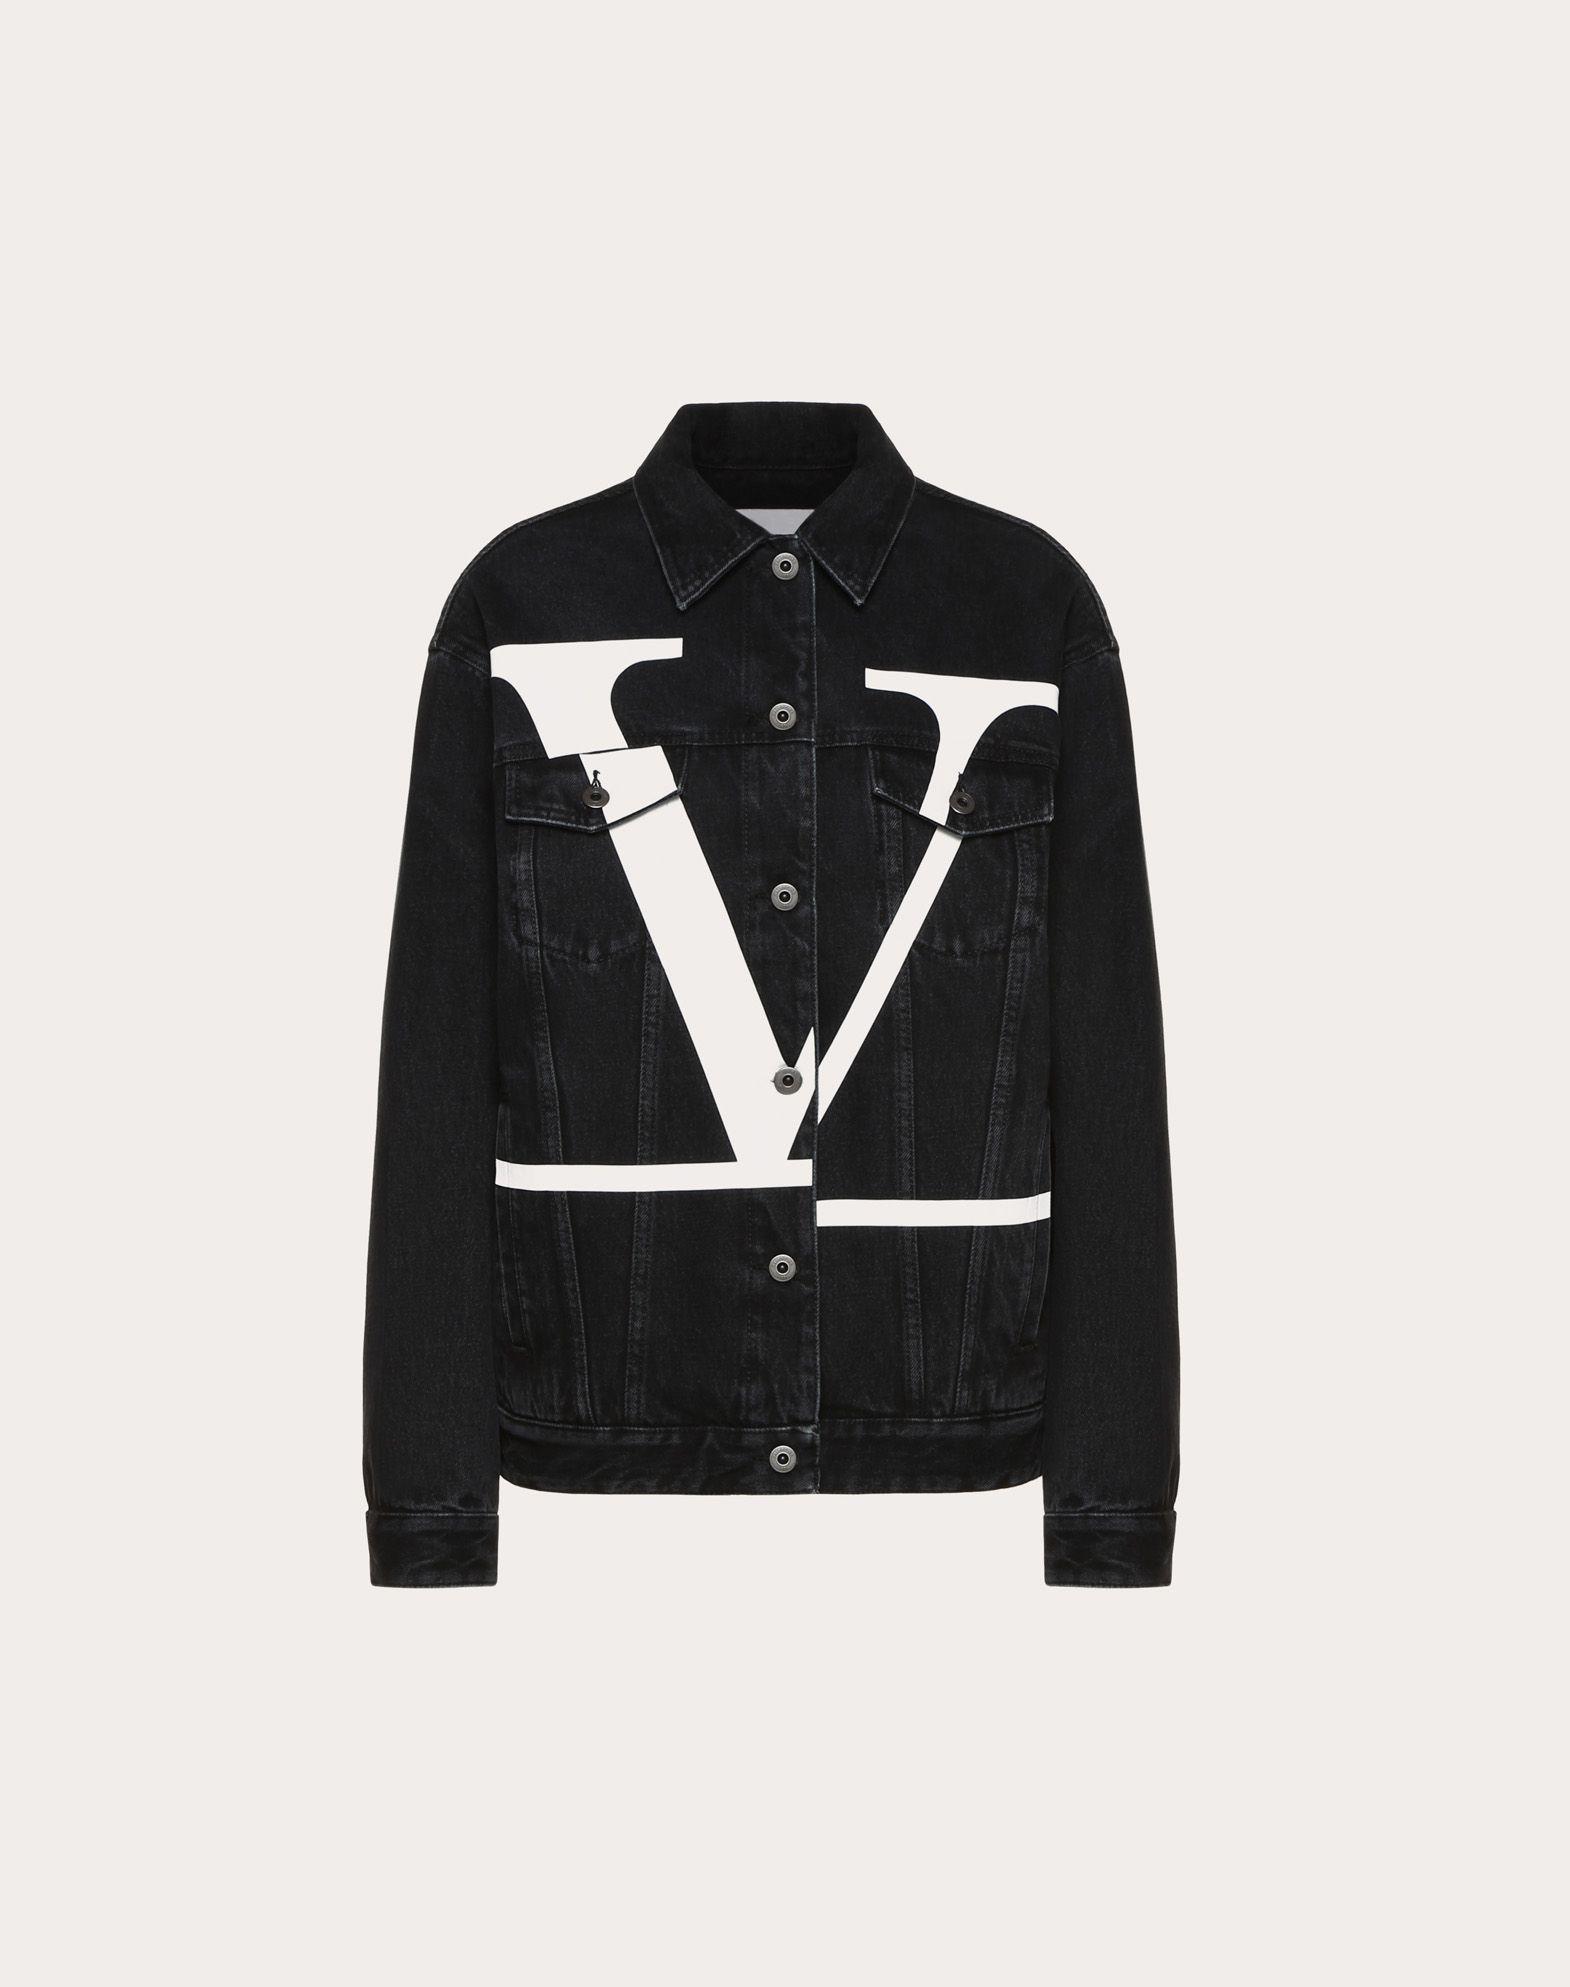 Deconstructed VLOGO Denim Jacket